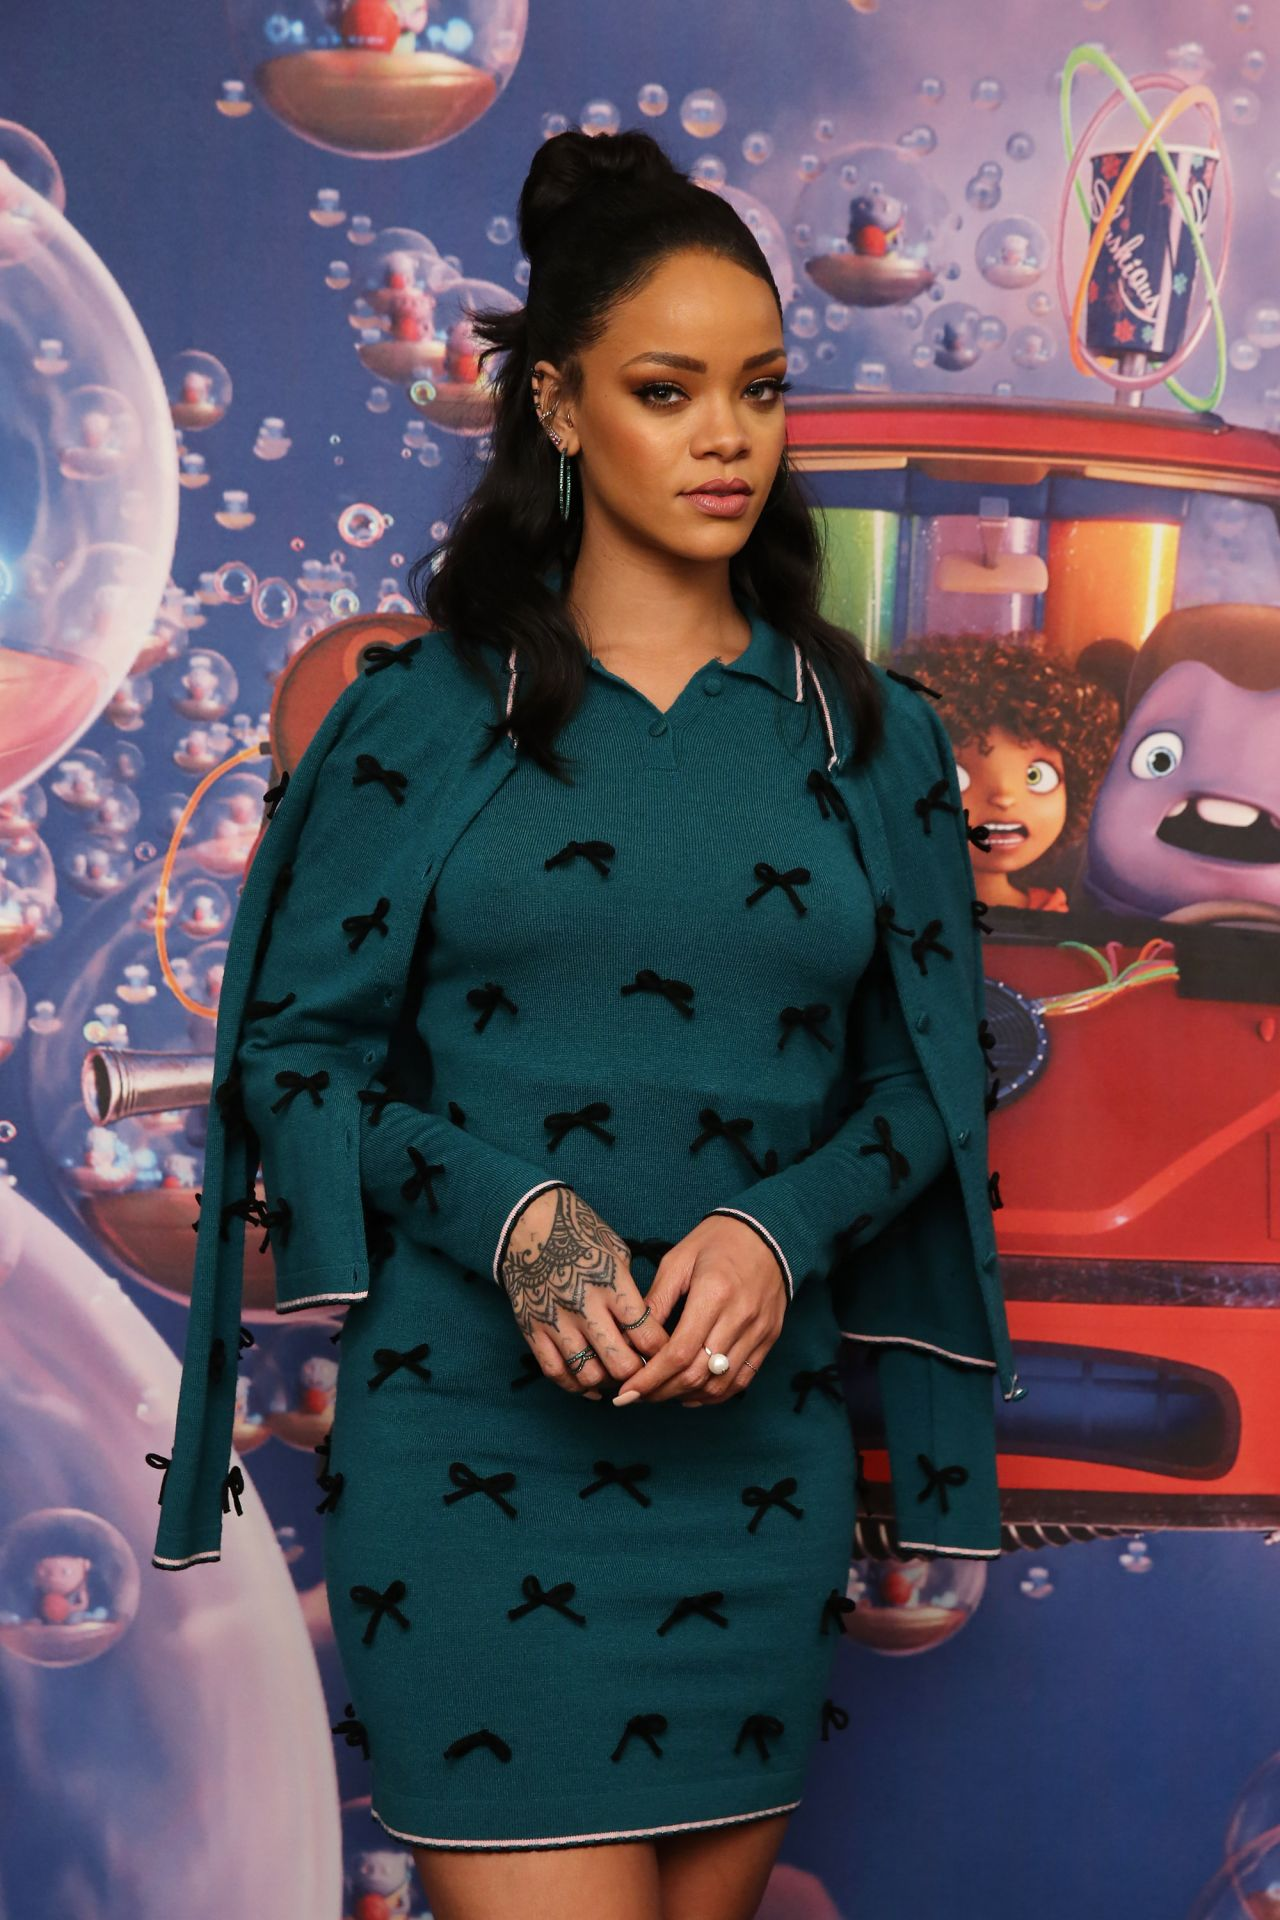 Rihanna - Promoting